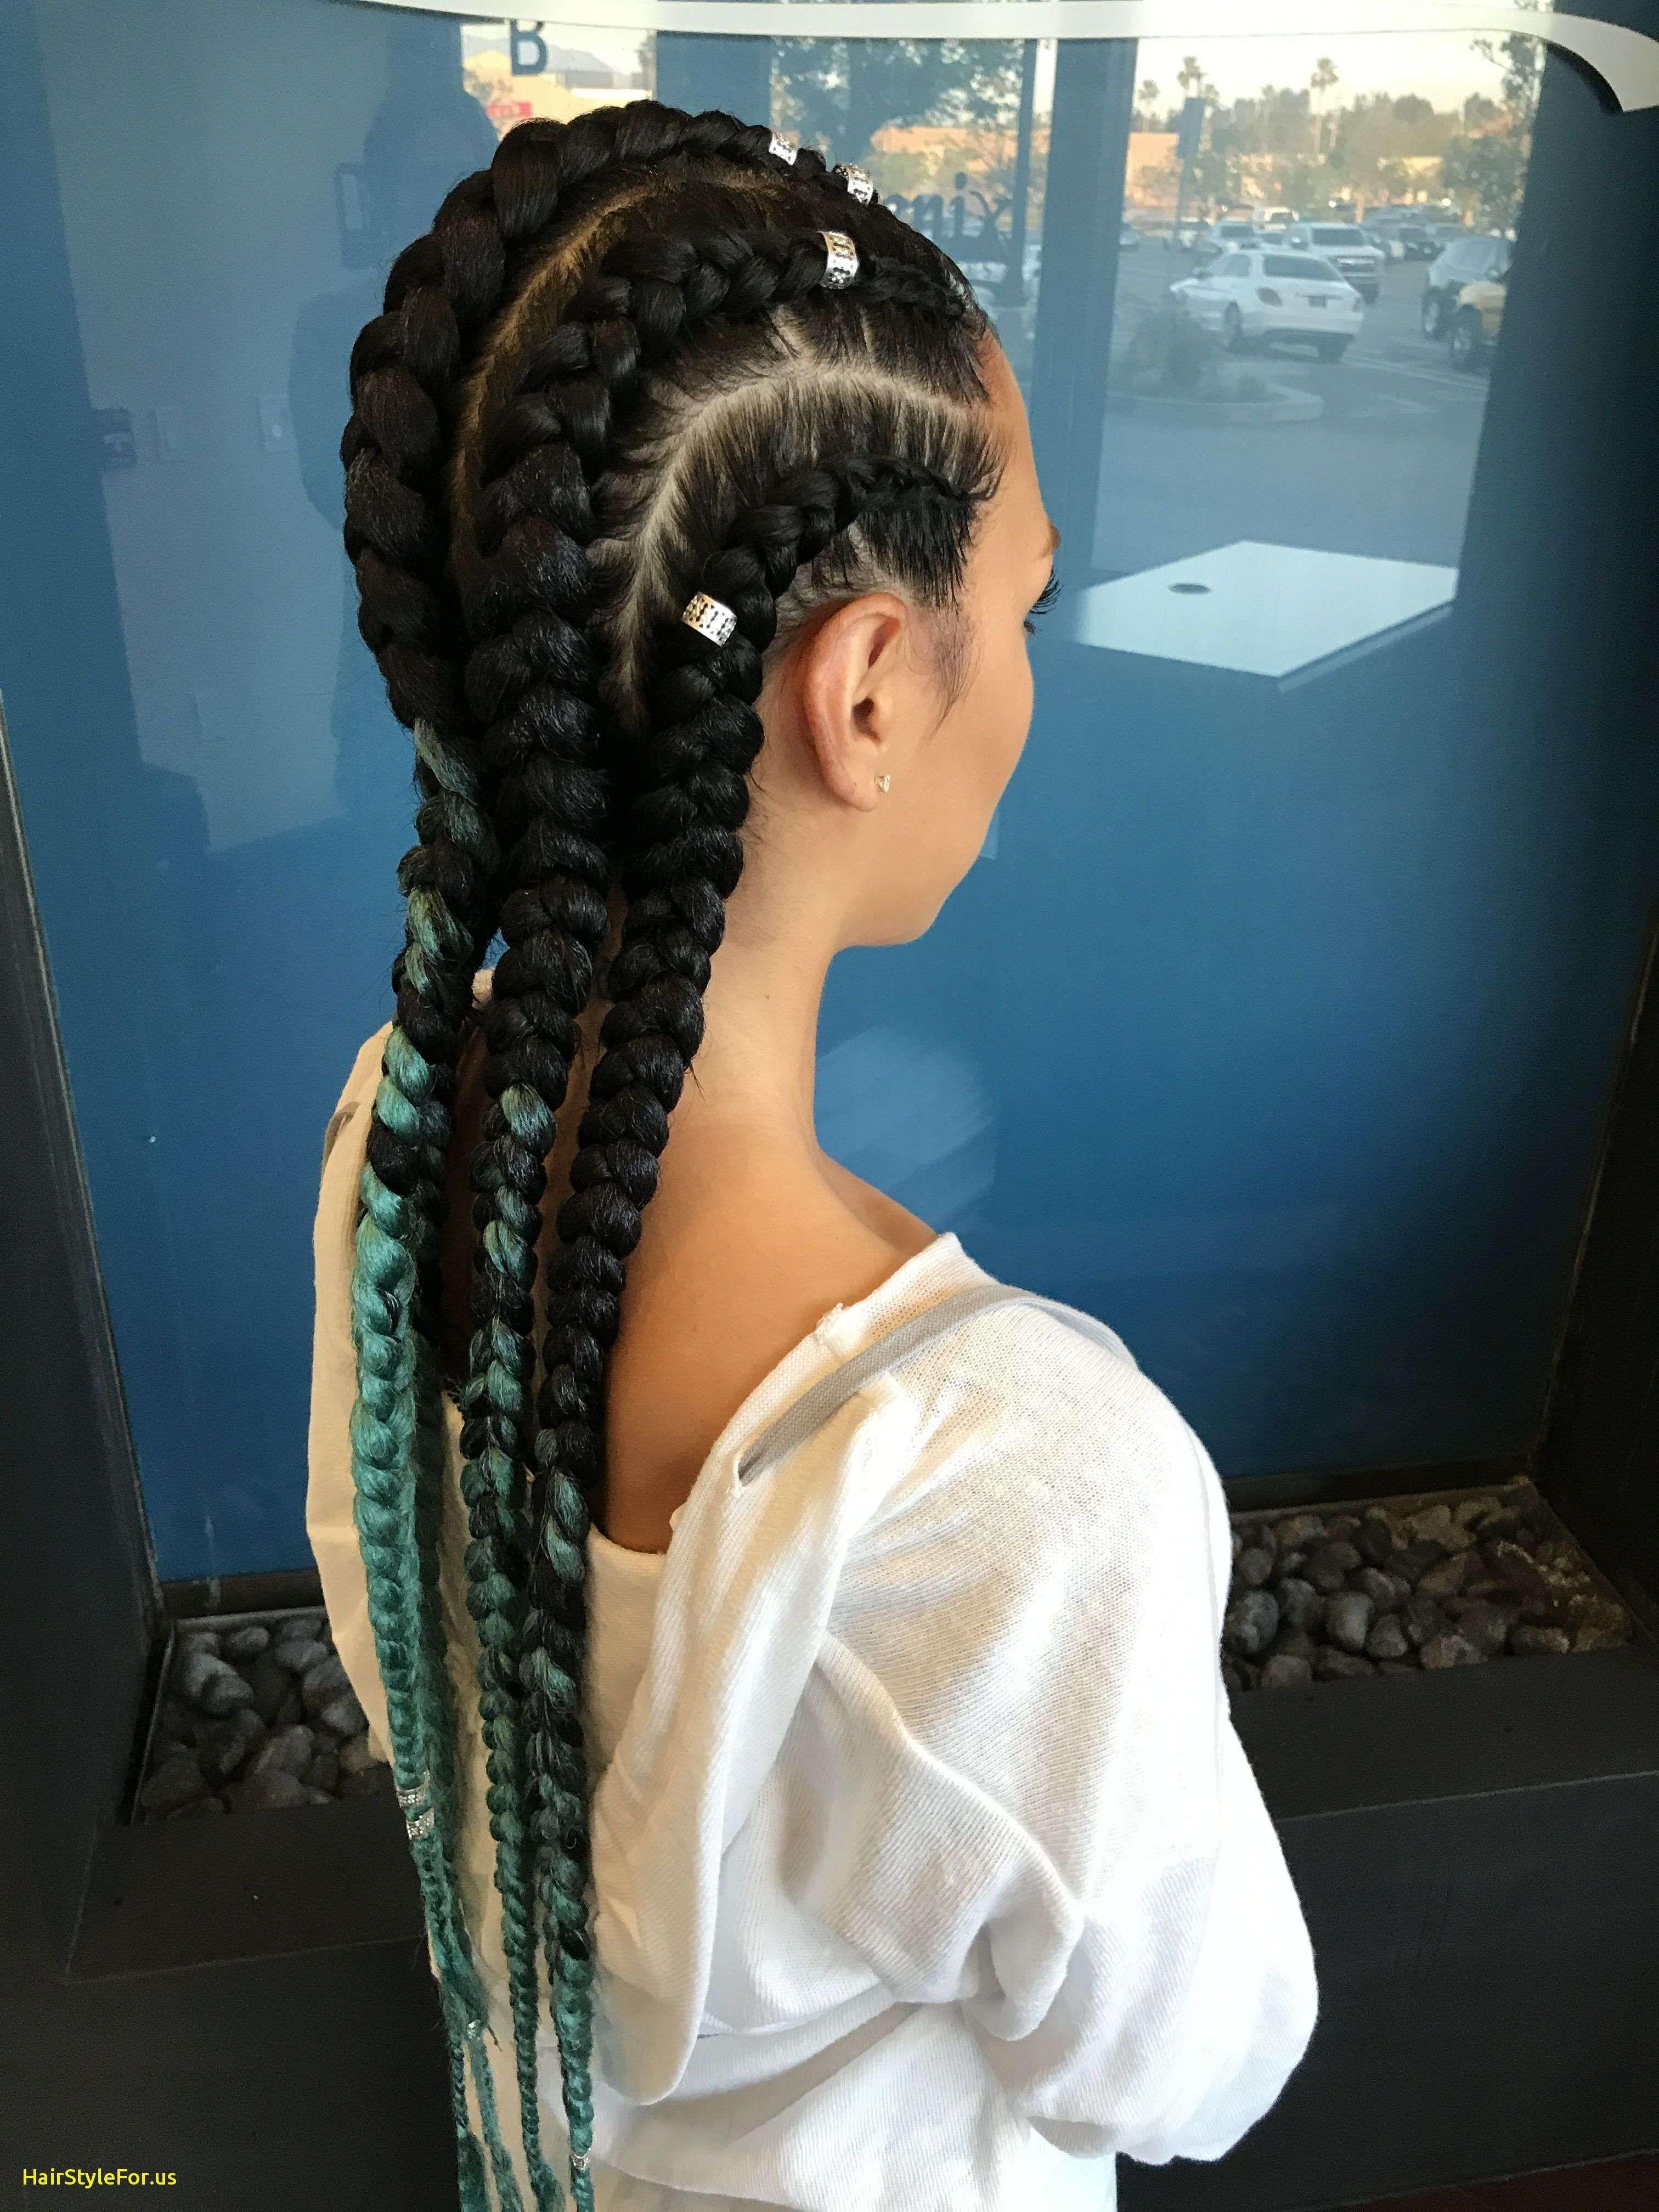 Top 25 French Braid Pigtails Black Hair Aaron Gardner Top 25 French Braid Pigtails Black Hair Allowed Cornrow Hairstyles Braided Hairstyles Braided Hairdo